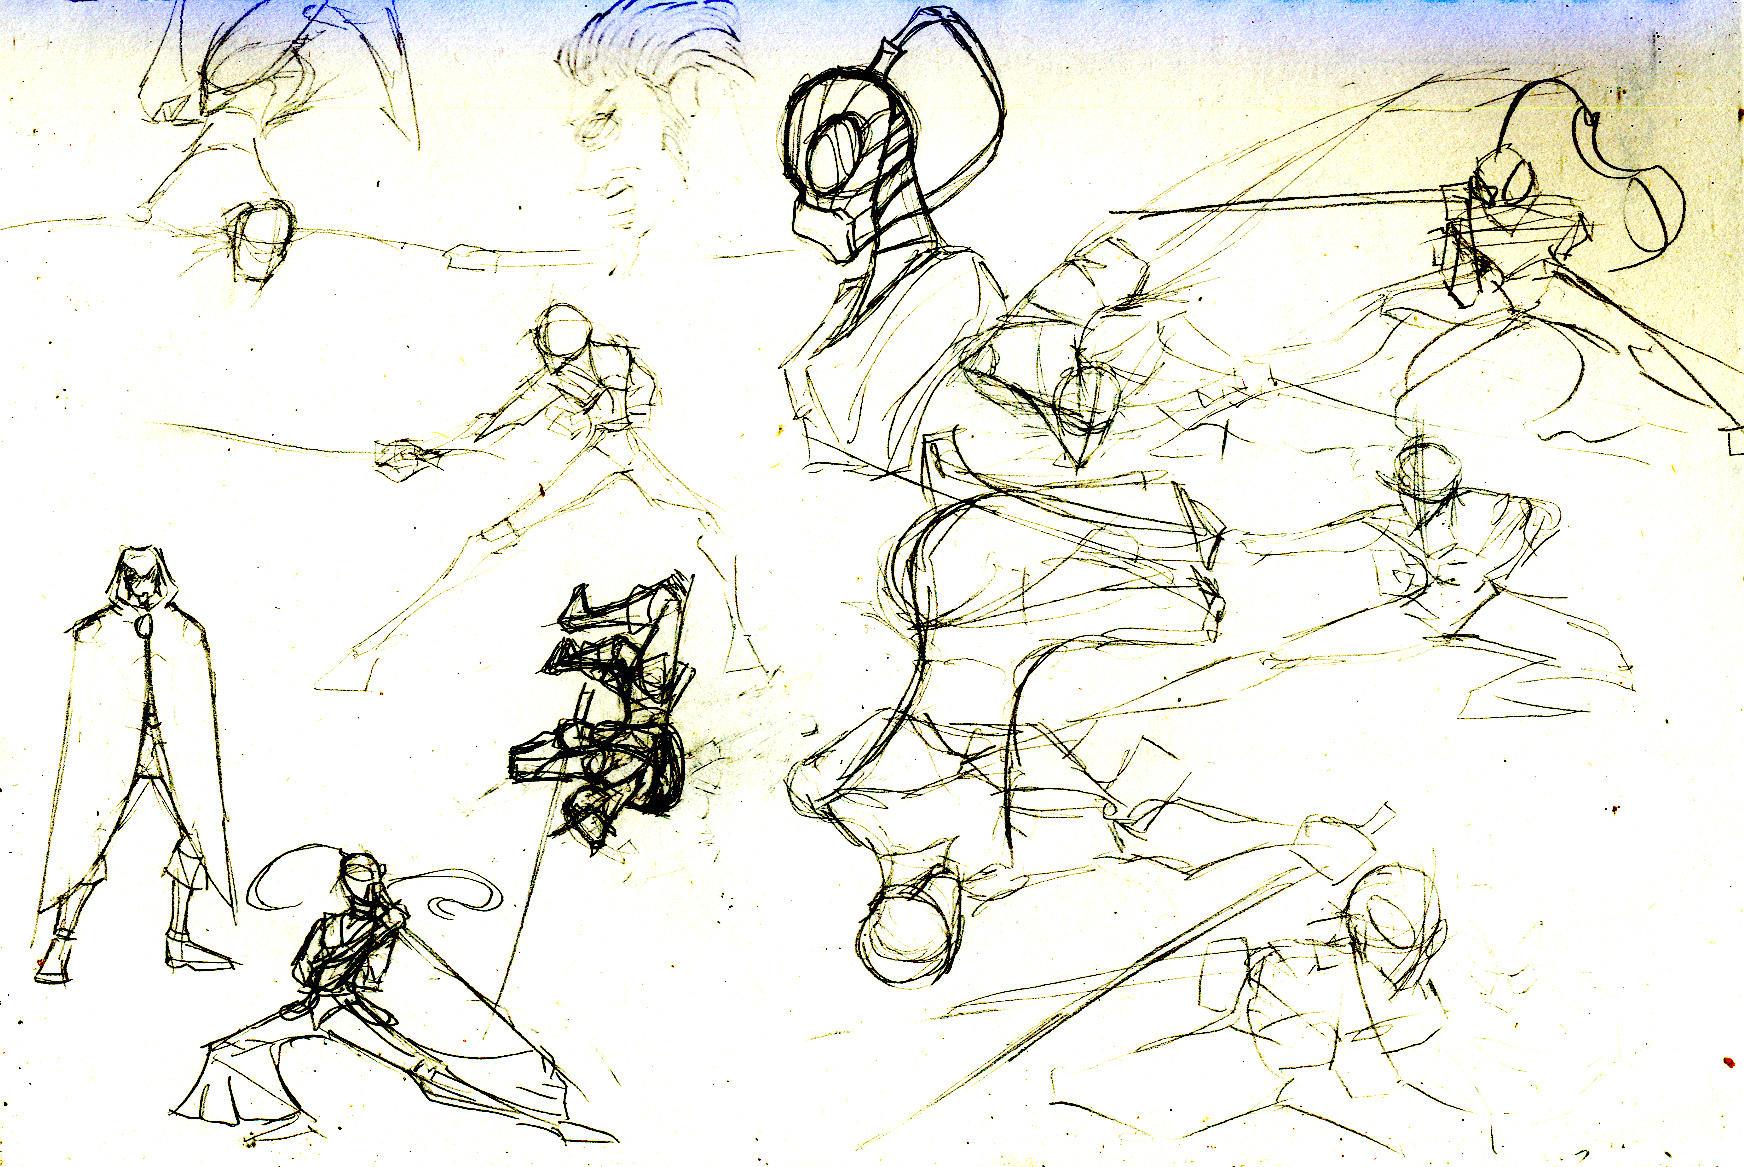 Dynamic sword poses